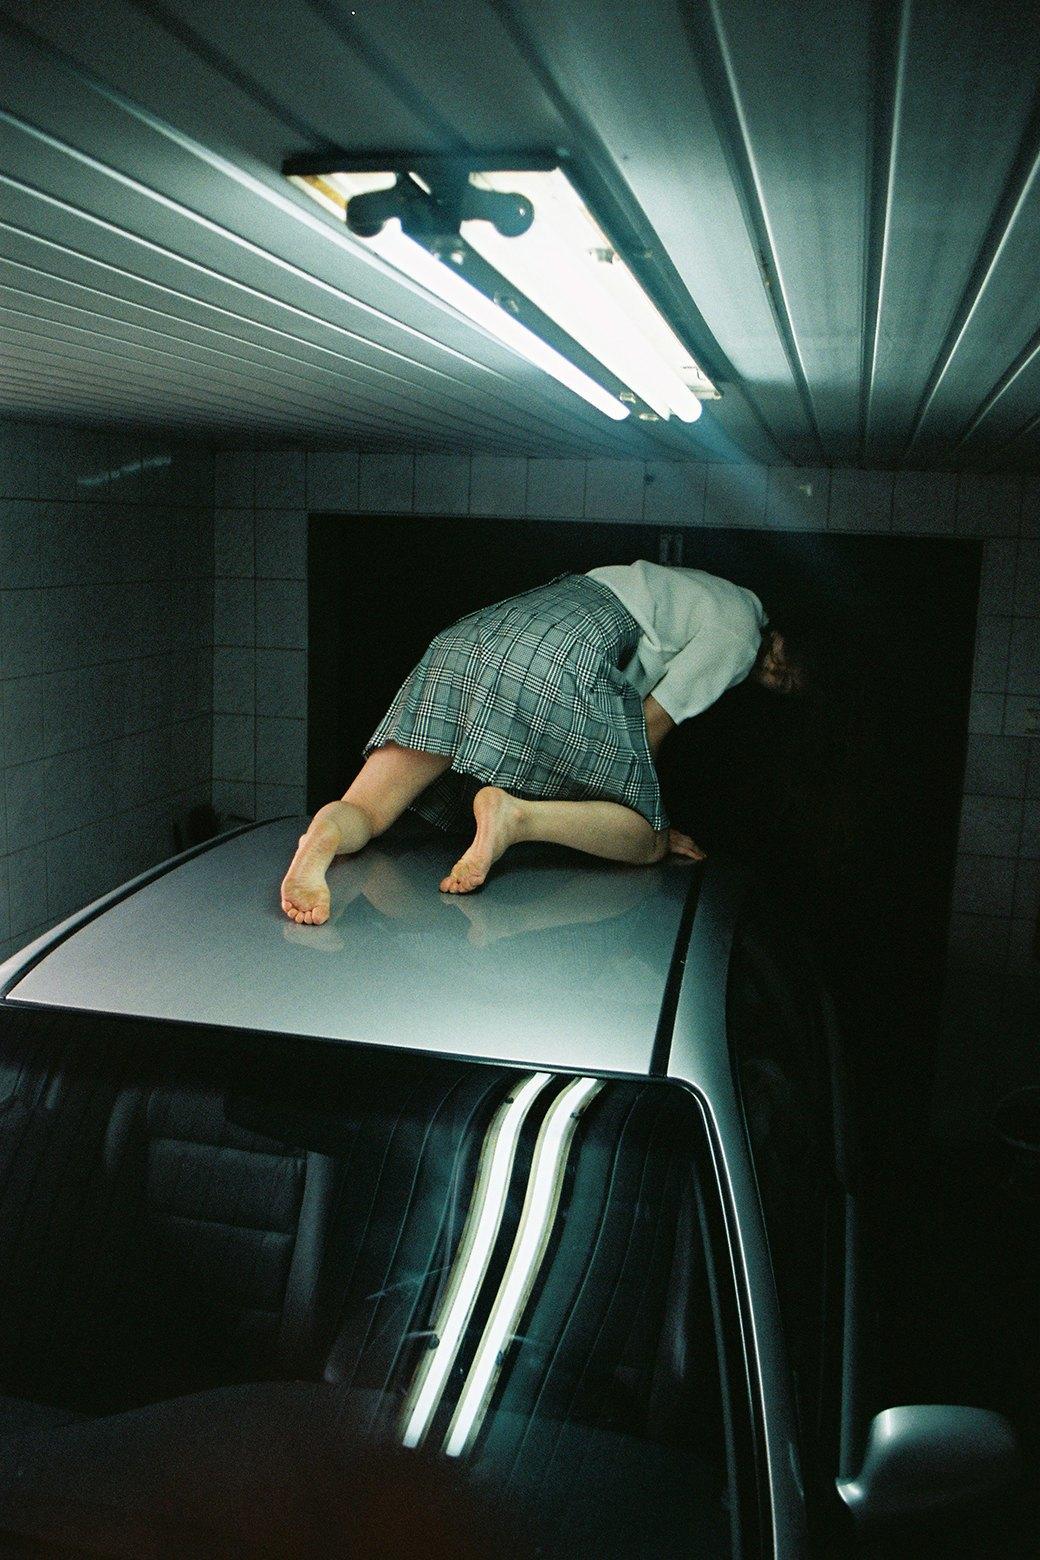 Лукаш Вержбовски: Галерейная эротика и геометрия тела. Изображение № 9.